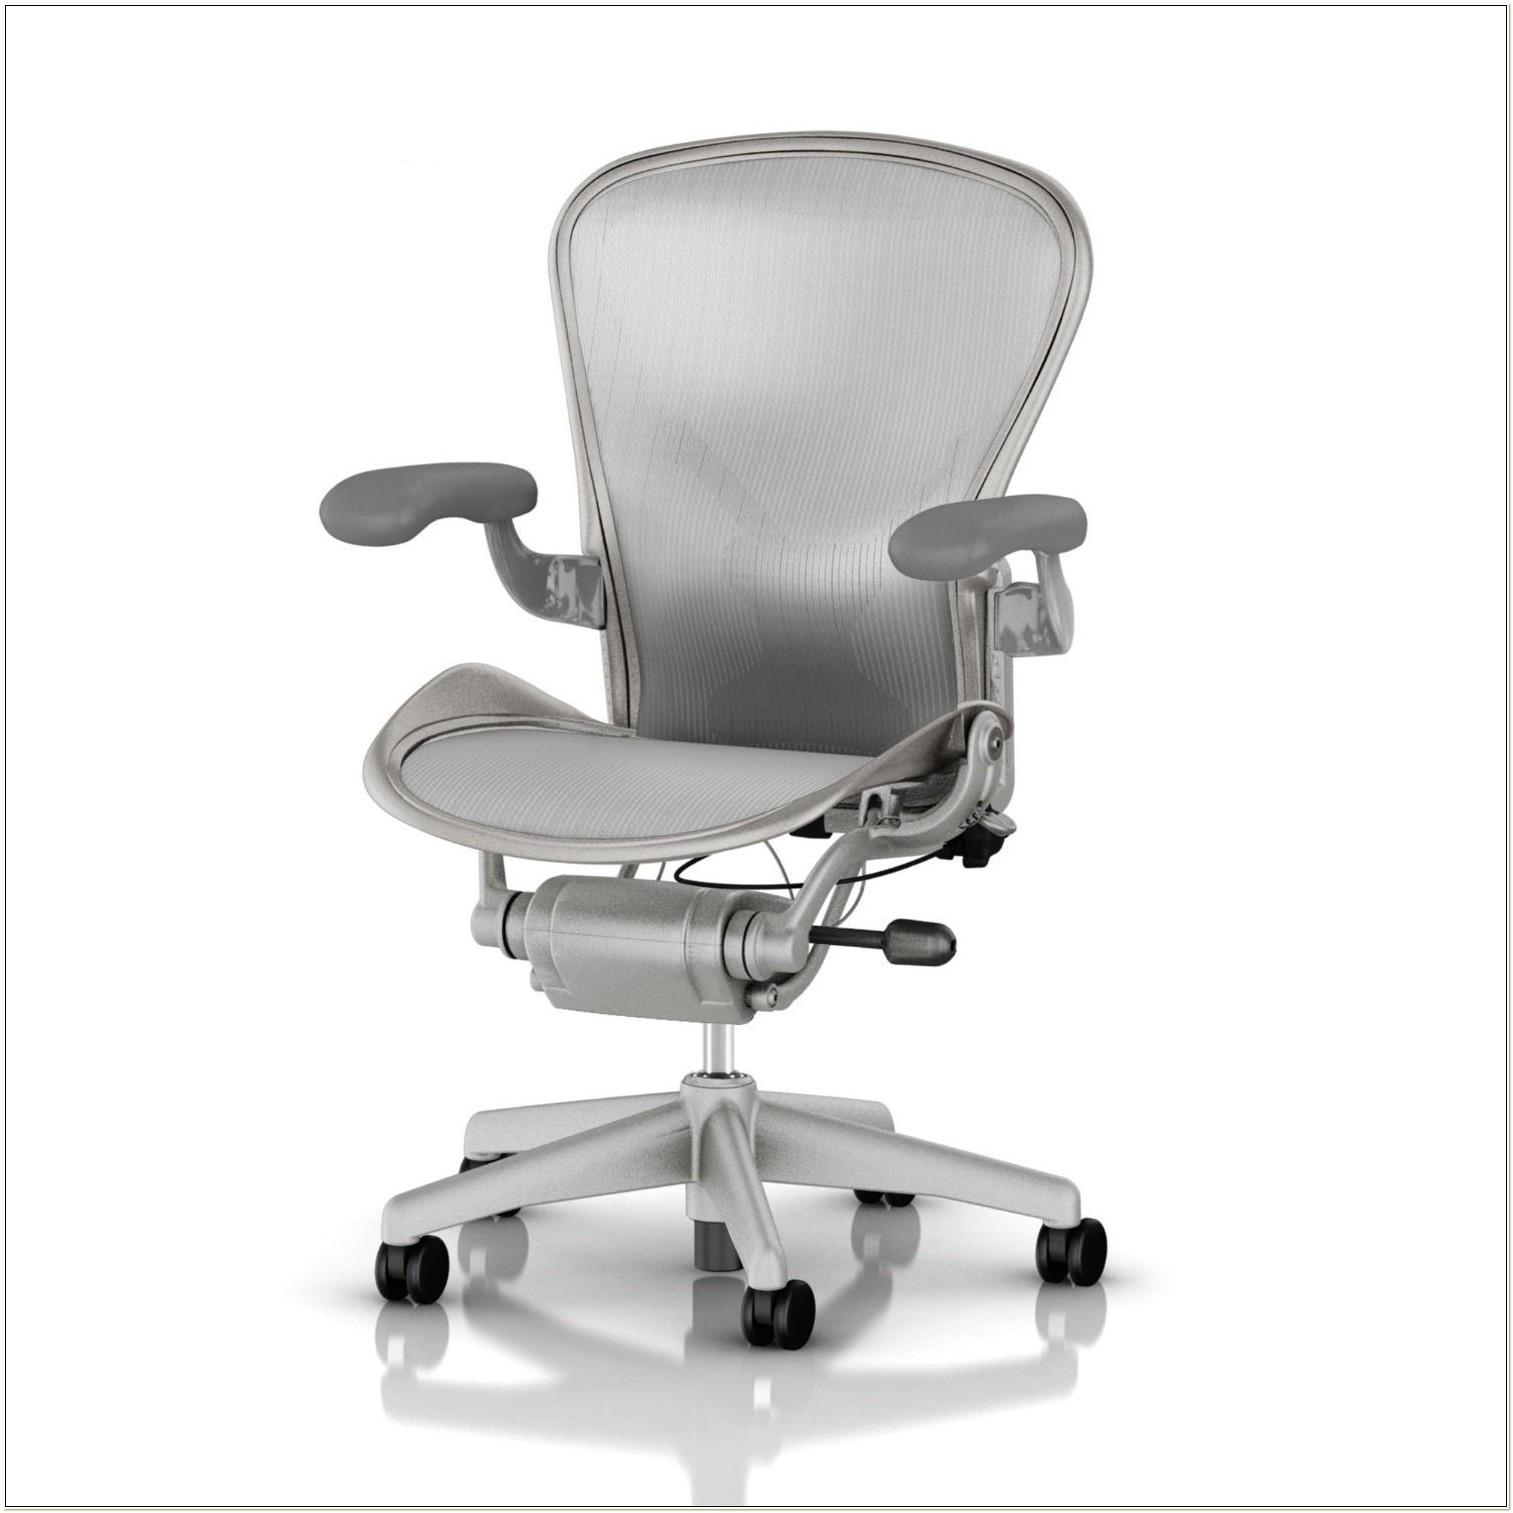 Herman Miller Aeron Task Chair Model Ae113awb